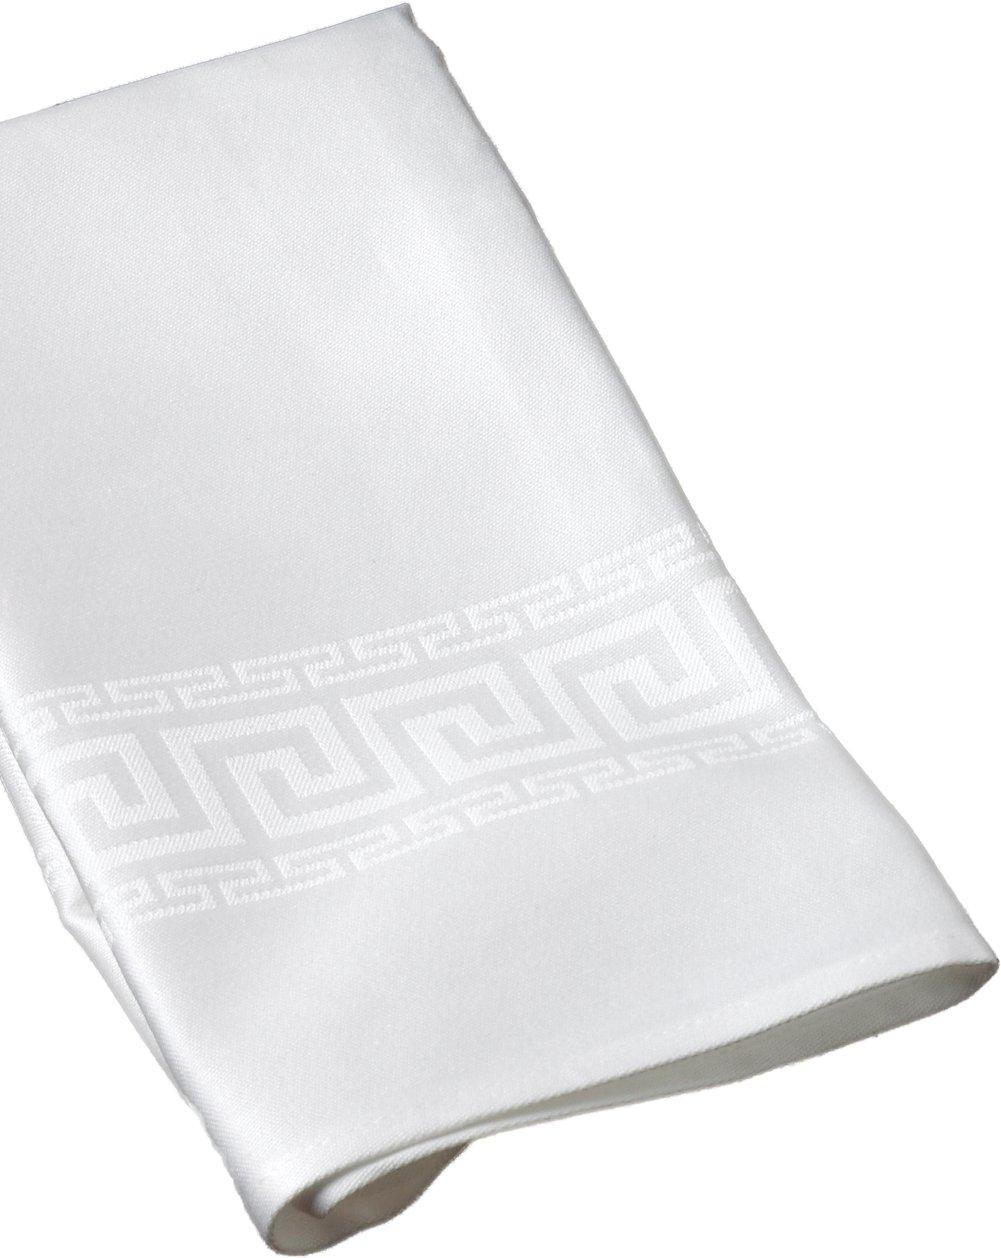 (Oyster) - Elegant Greek Key Design Damask Napkins, 50cm x 50cm, 100% Cotton, Set of 4 (Oyster Colour)  オイスター B00C4AI5EM